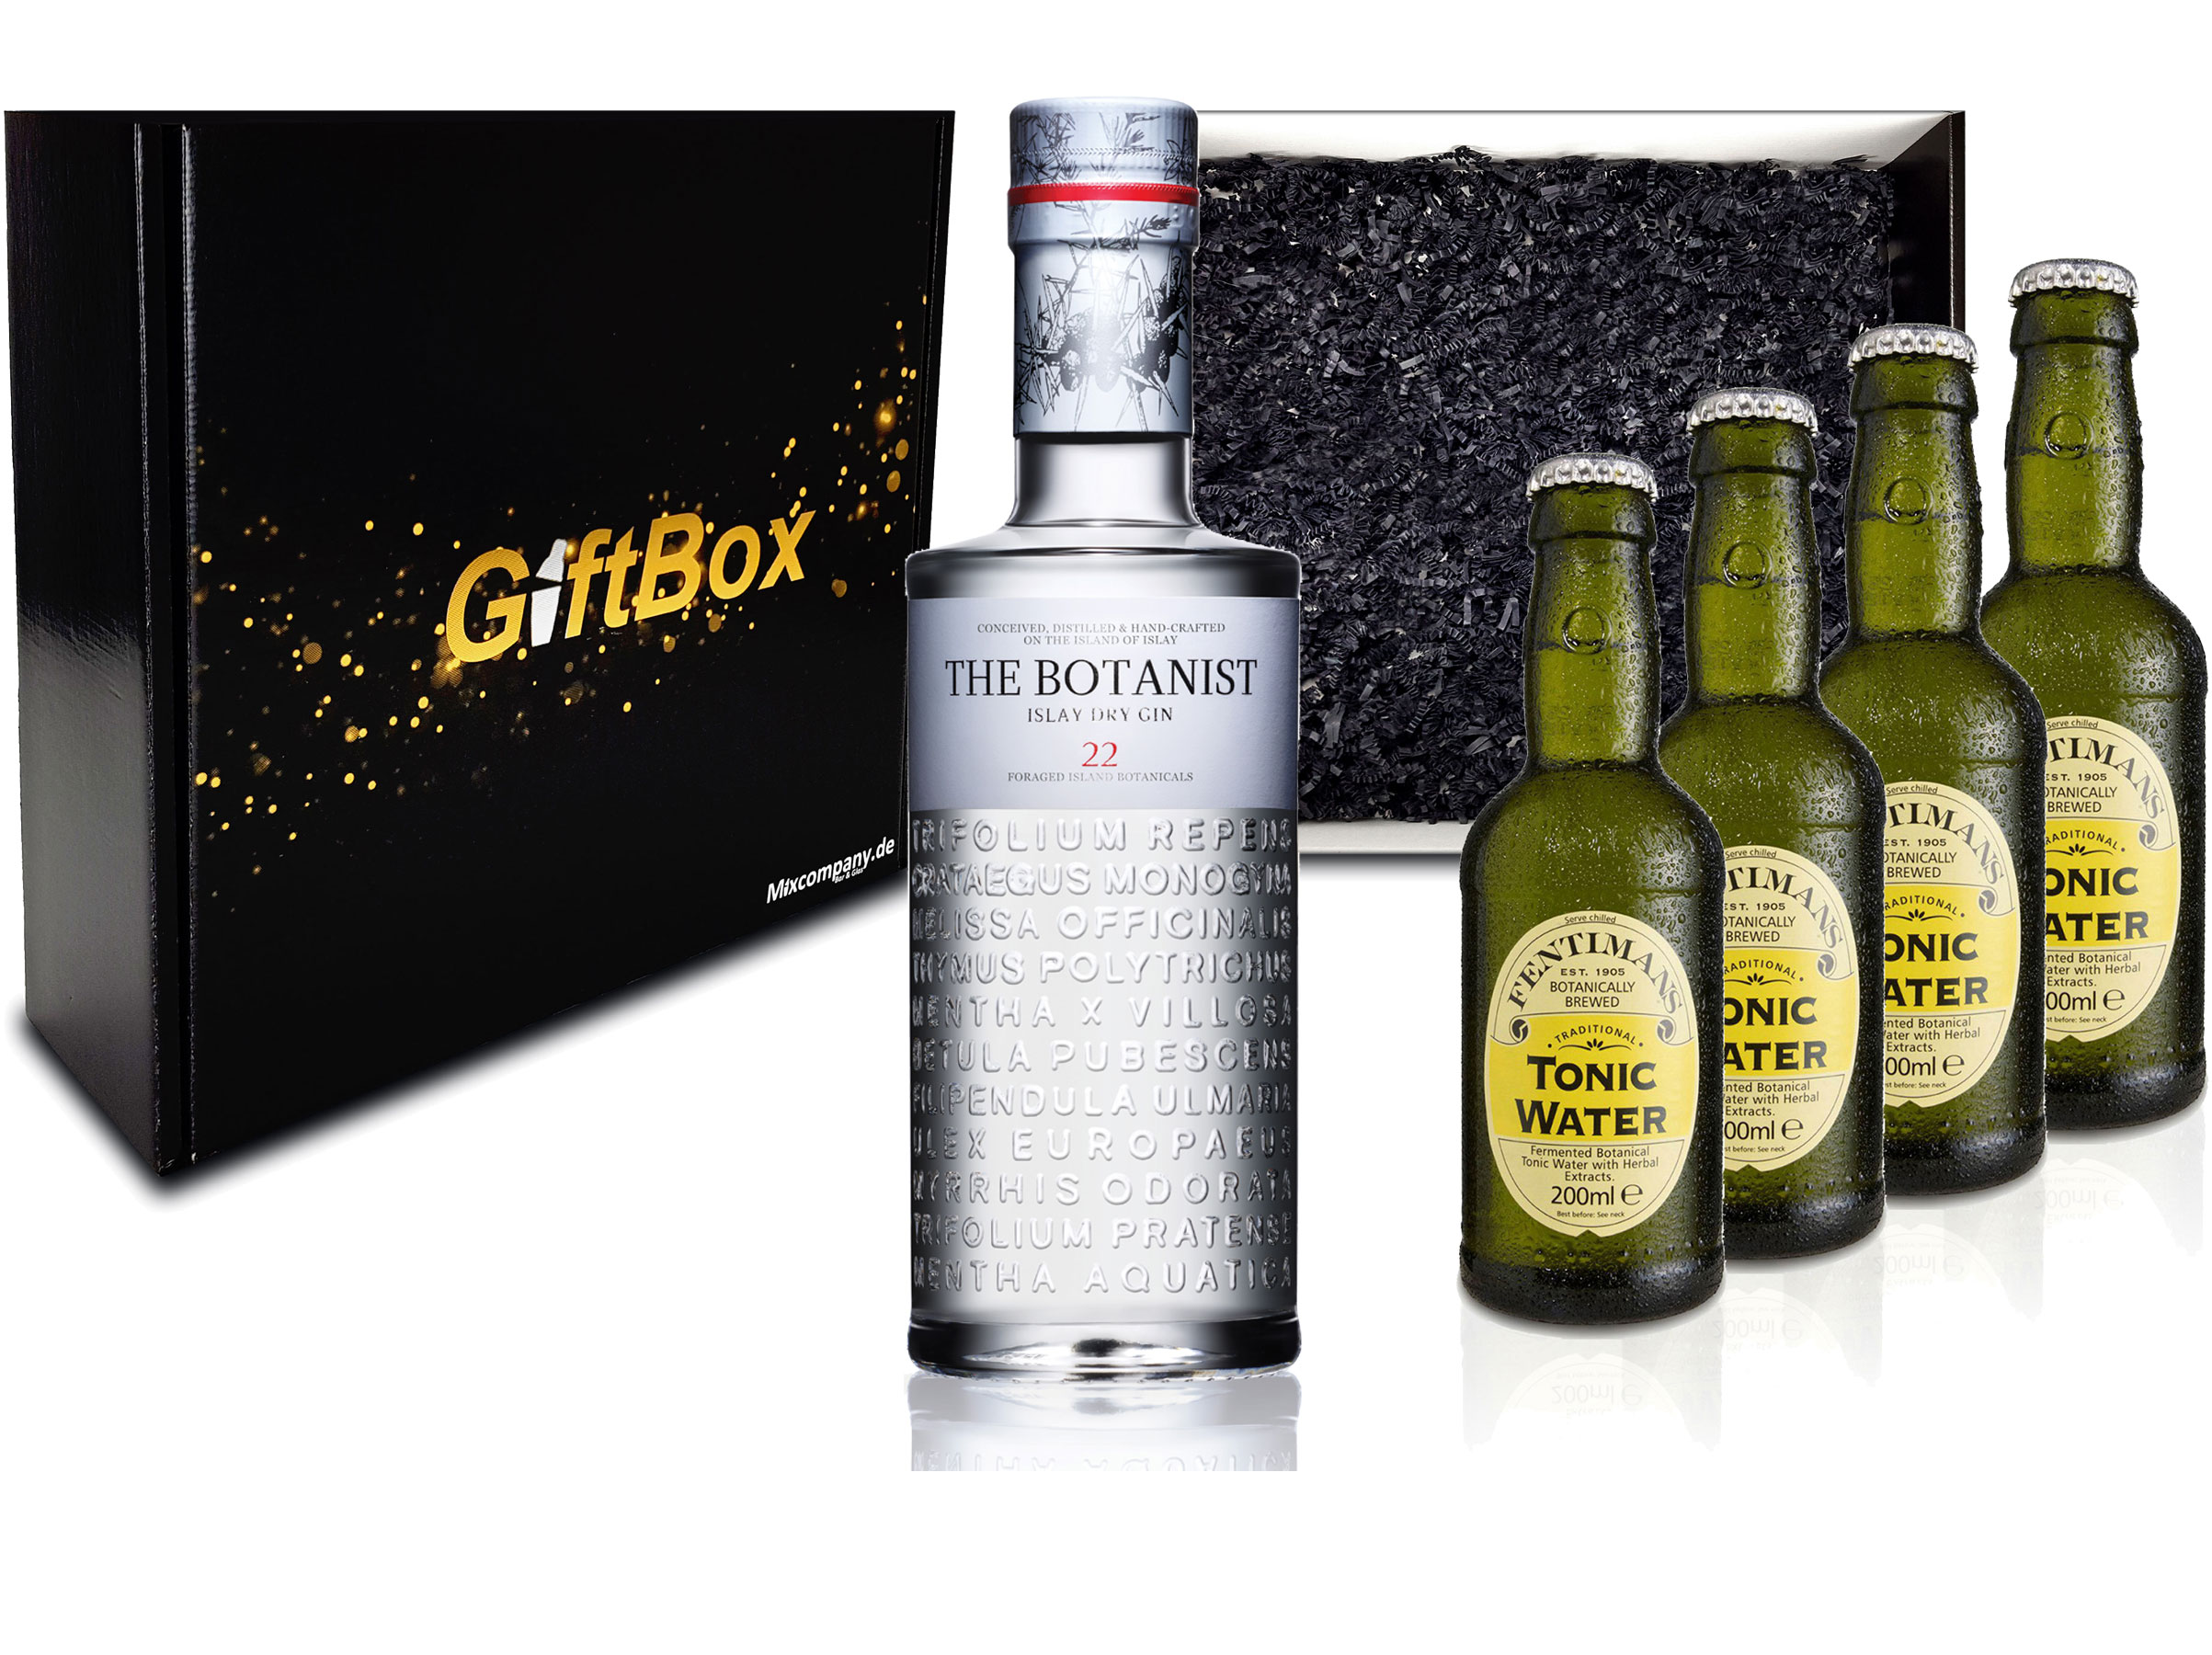 Gin Tonic Geschenkset - The Botanist Islay Dry Gin 0,7l 700ml (46% Vol) + 4x Fentimans Tonic Water 200ml inkl. Pfand MEHRWEG + Geschenkverpackung